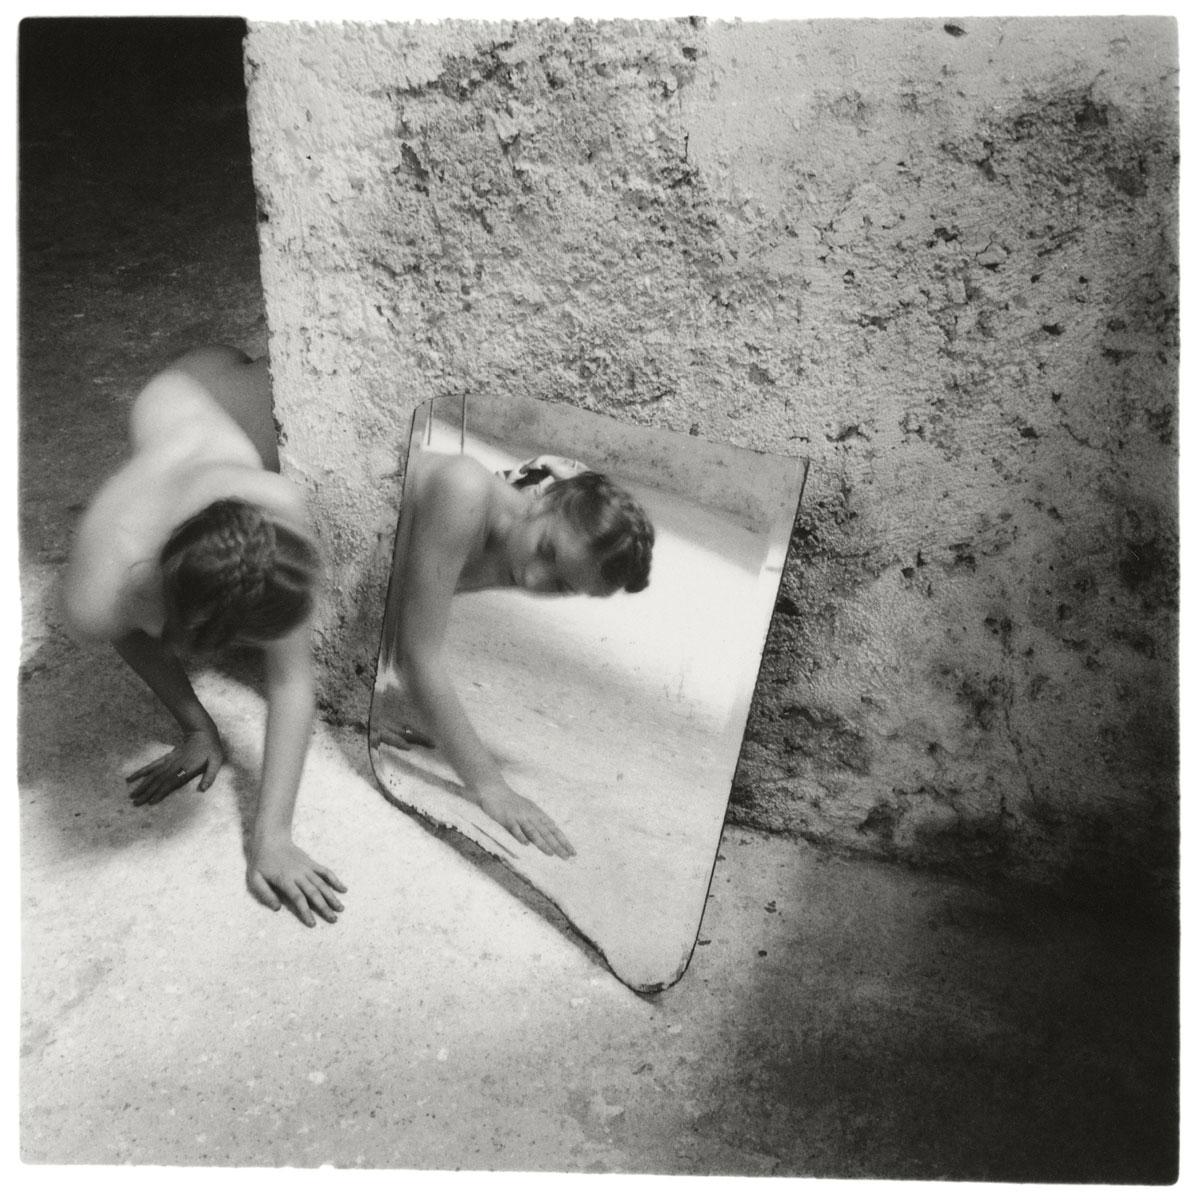 Fotó: Francesca Woodman<br />Self-deceit #1, Rome, Italy, 1978<br />© George and Betty Woodman